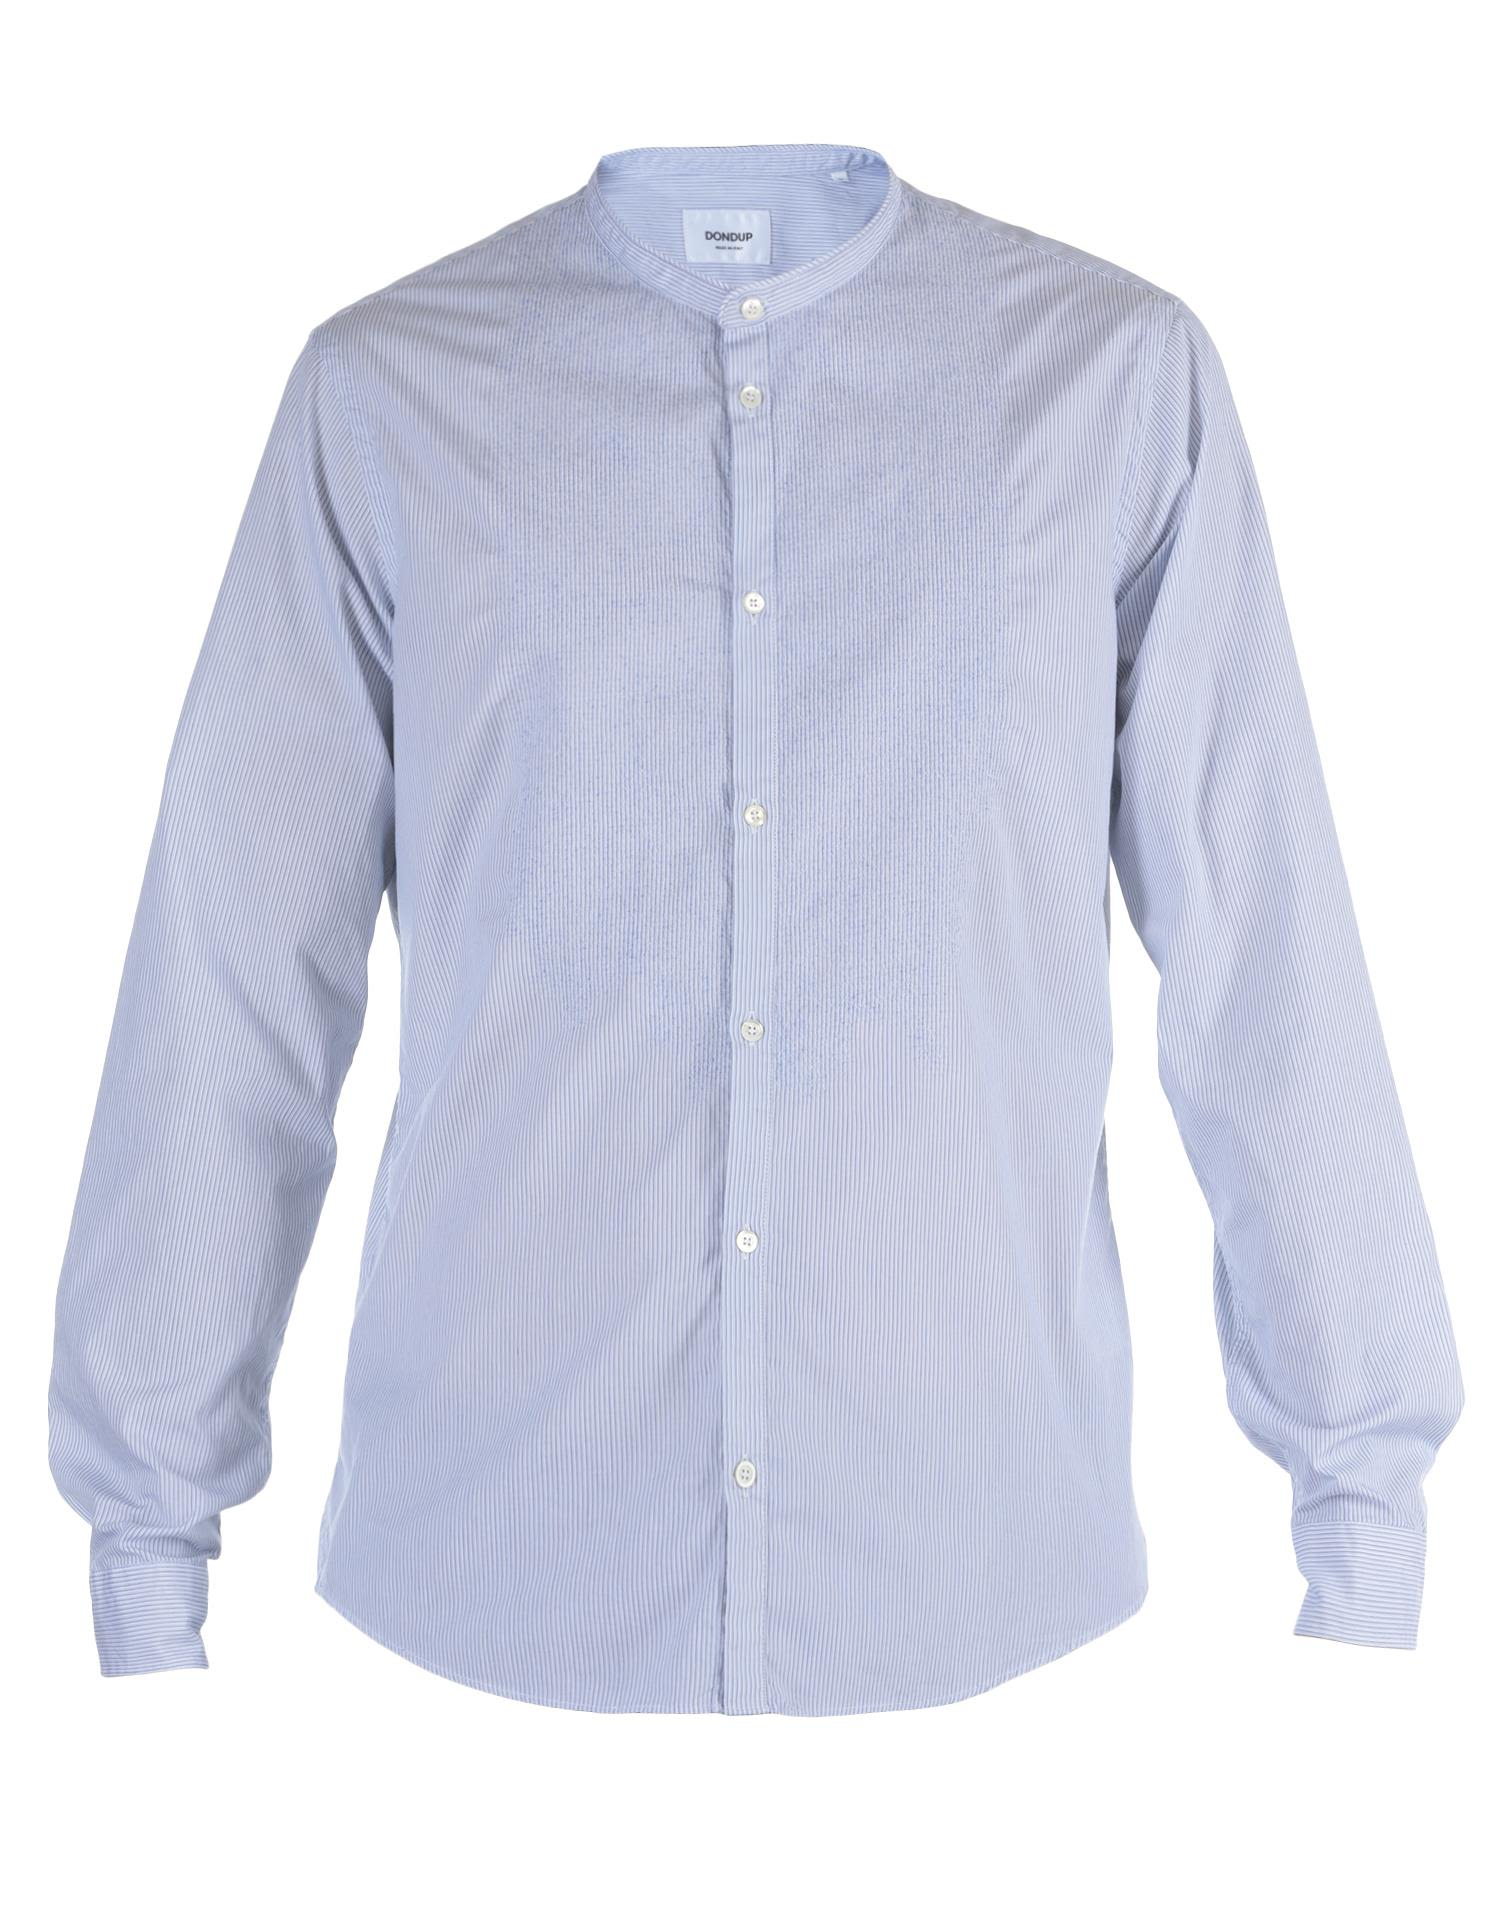 Dondup Guru Piping Shirt